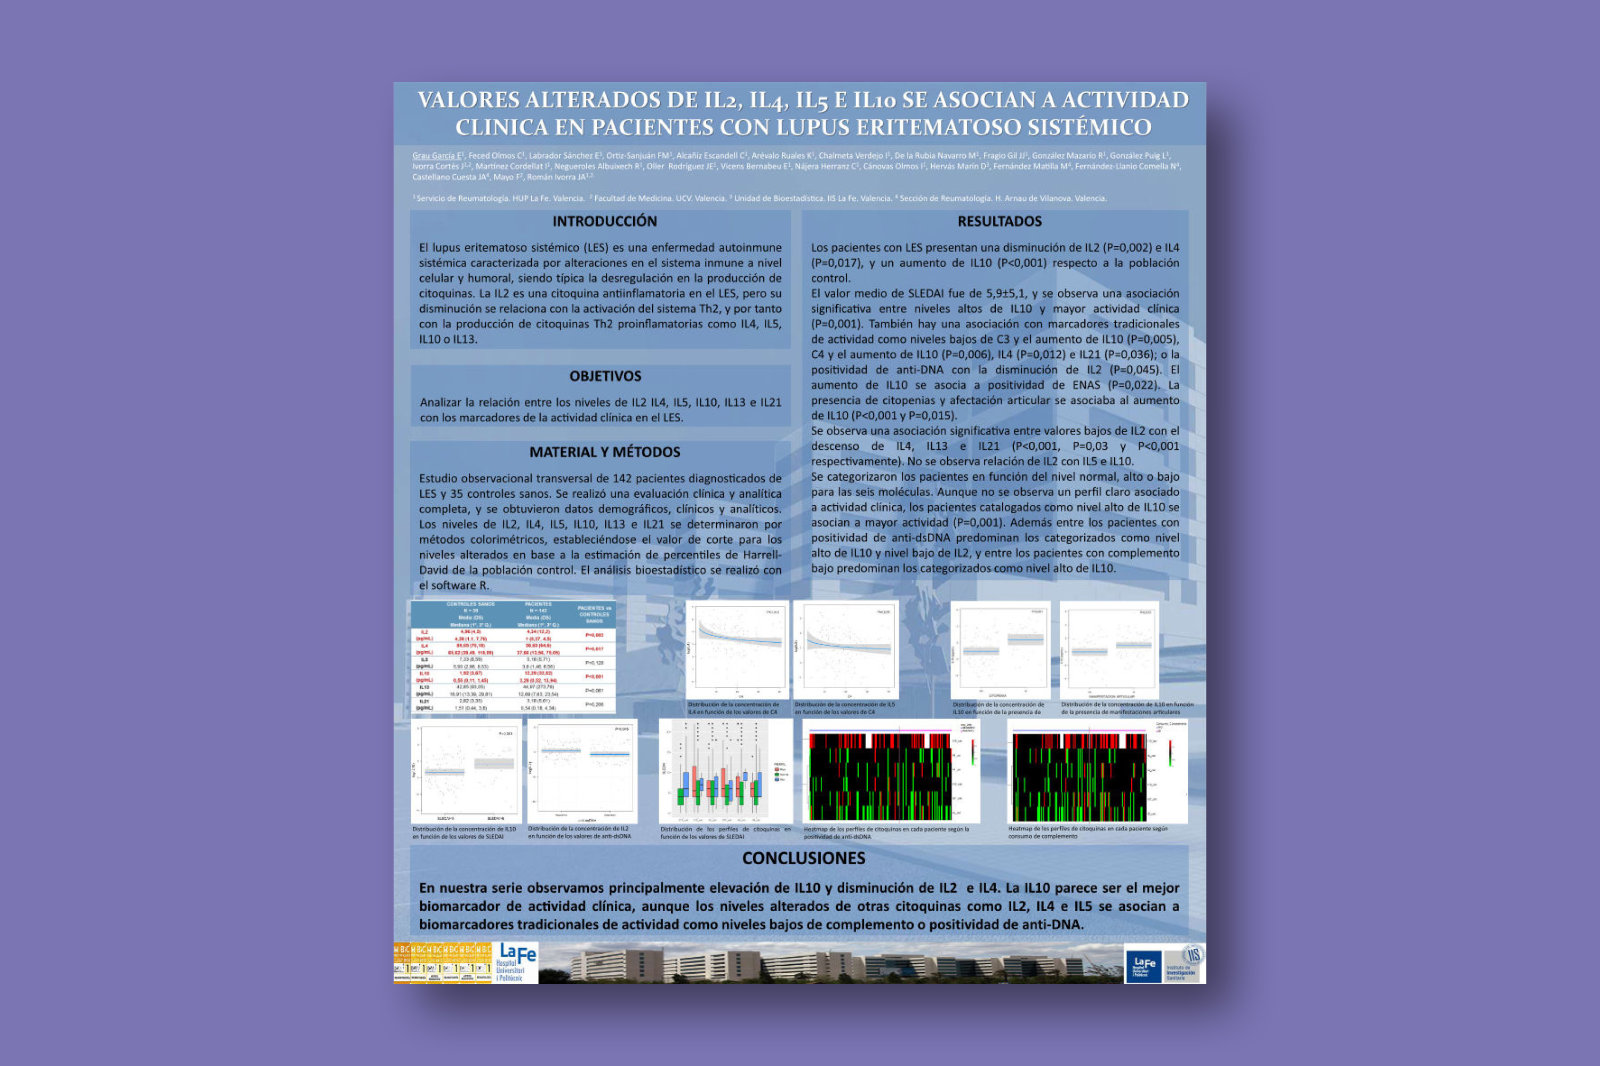 Valores alterados de IL2, IL4, IL5 e IL10 se asocian a actividad clinica en pacientes con Lupus Eritematoso Sistémico